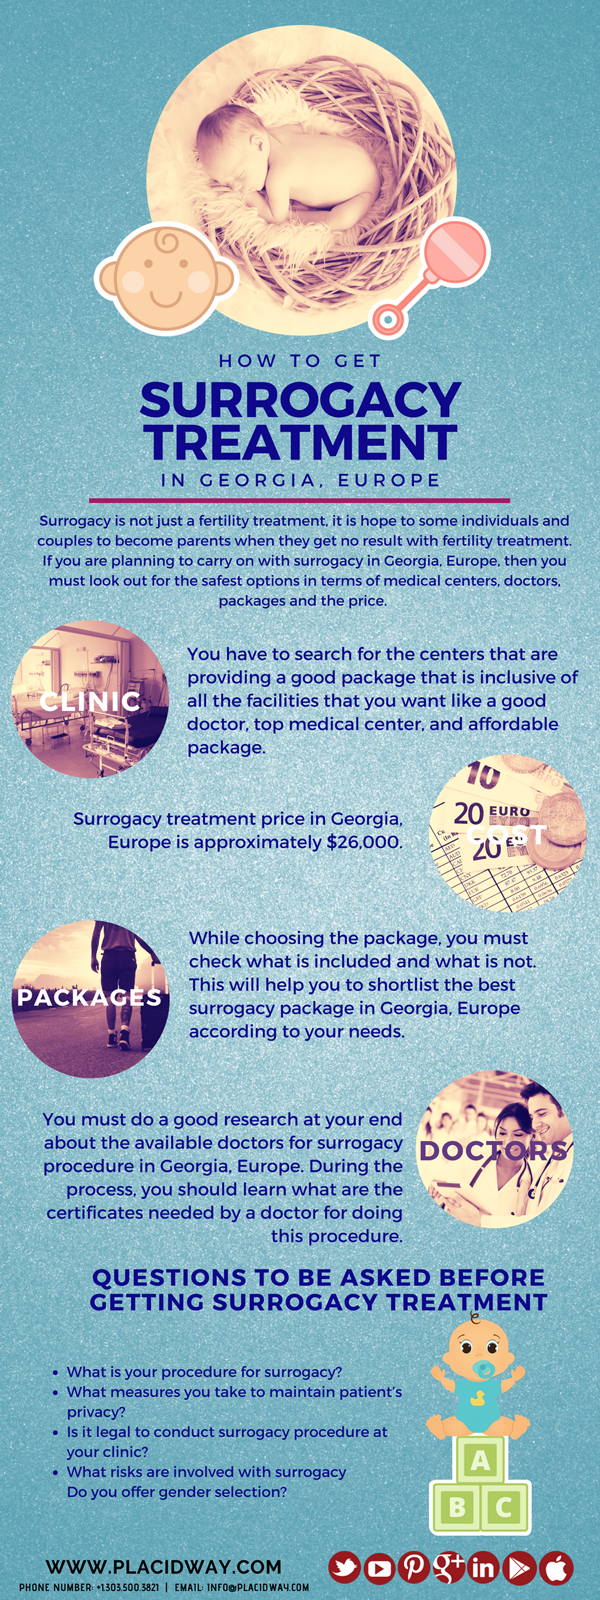 Infographics: How to Get Surrogacy Treatment in Georgia, Europe